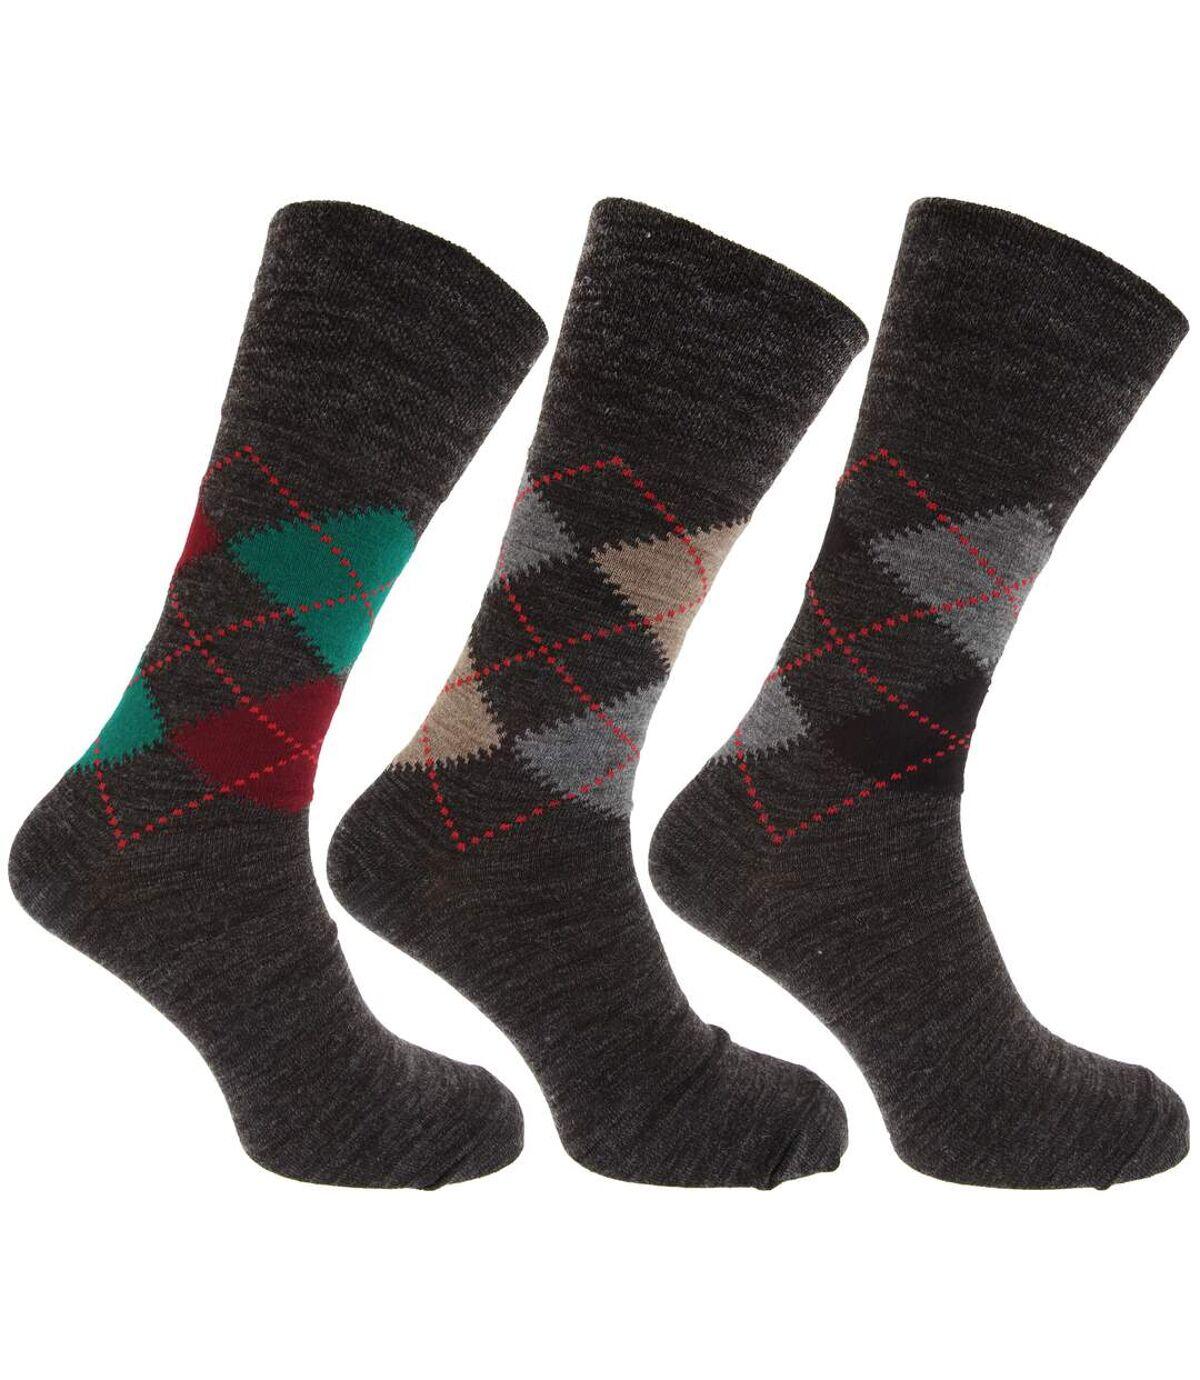 Mens Traditional Argyle Pattern Non Elastic Lambs Wool Blend Socks (Pack Of 3) (Shades of Grey) - UTMB276